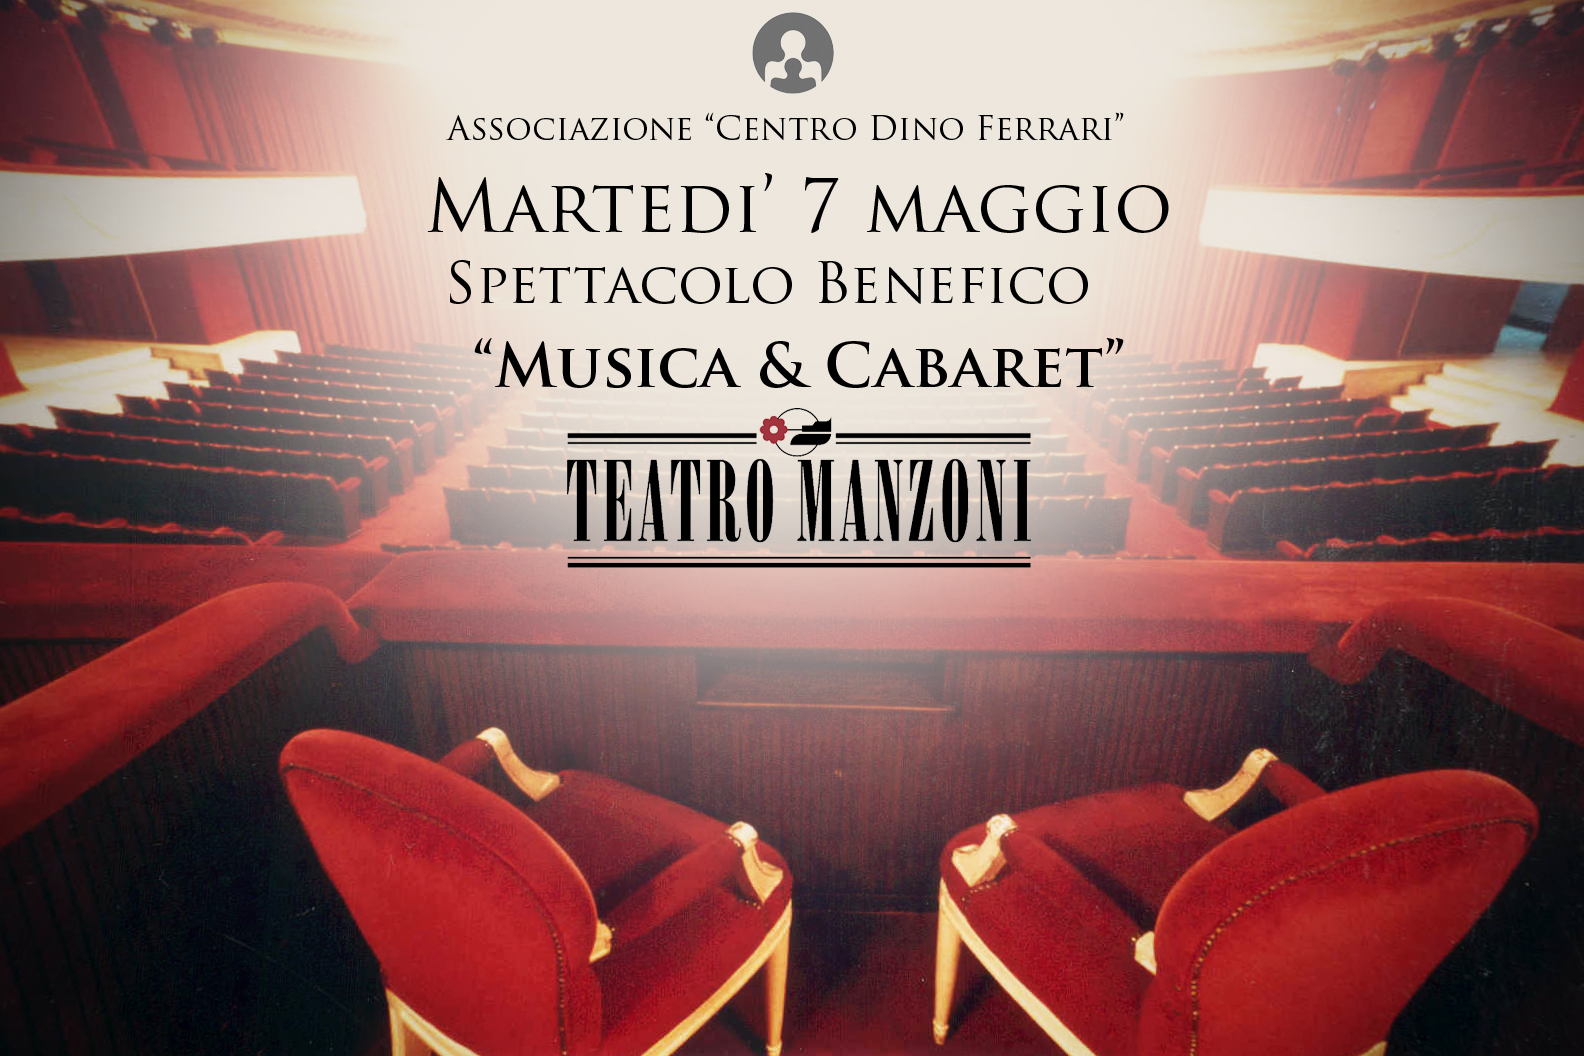 Teatro-interno-7-maggio-copy